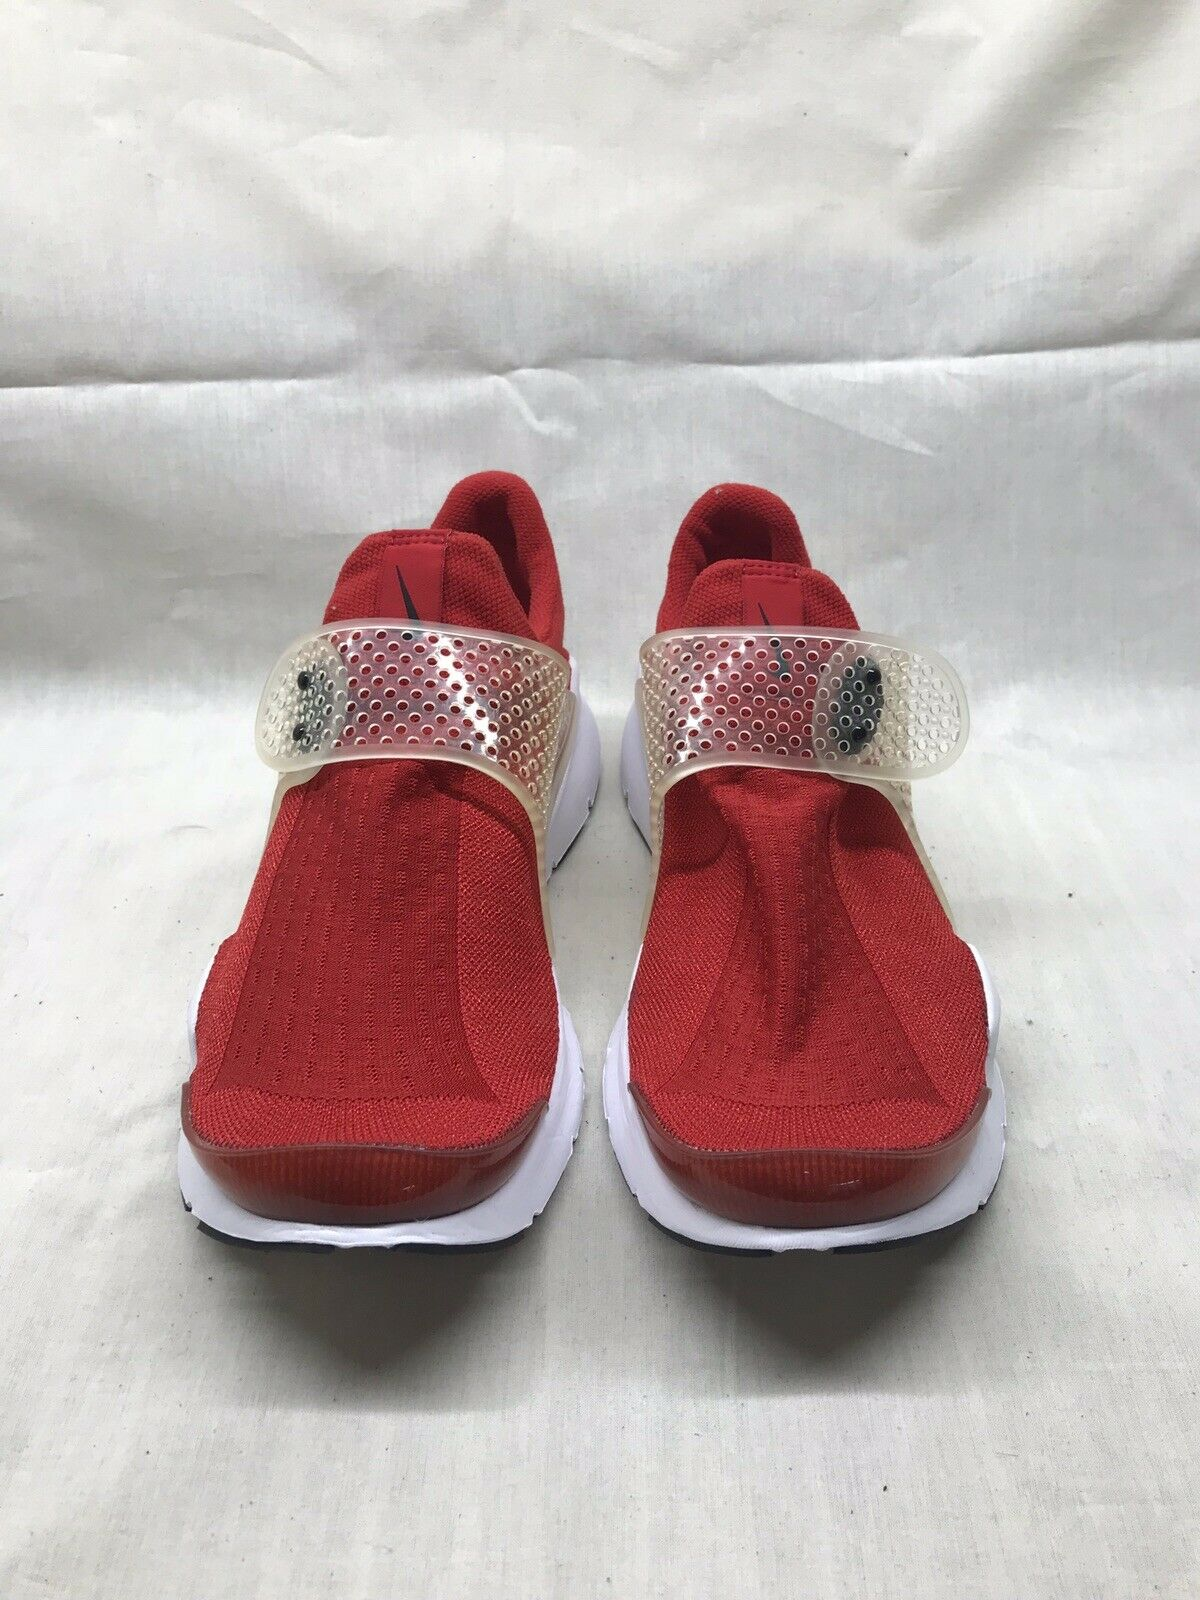 Brand New New New Unworn Nike Sock Dart Gym Red Size 11 caf916